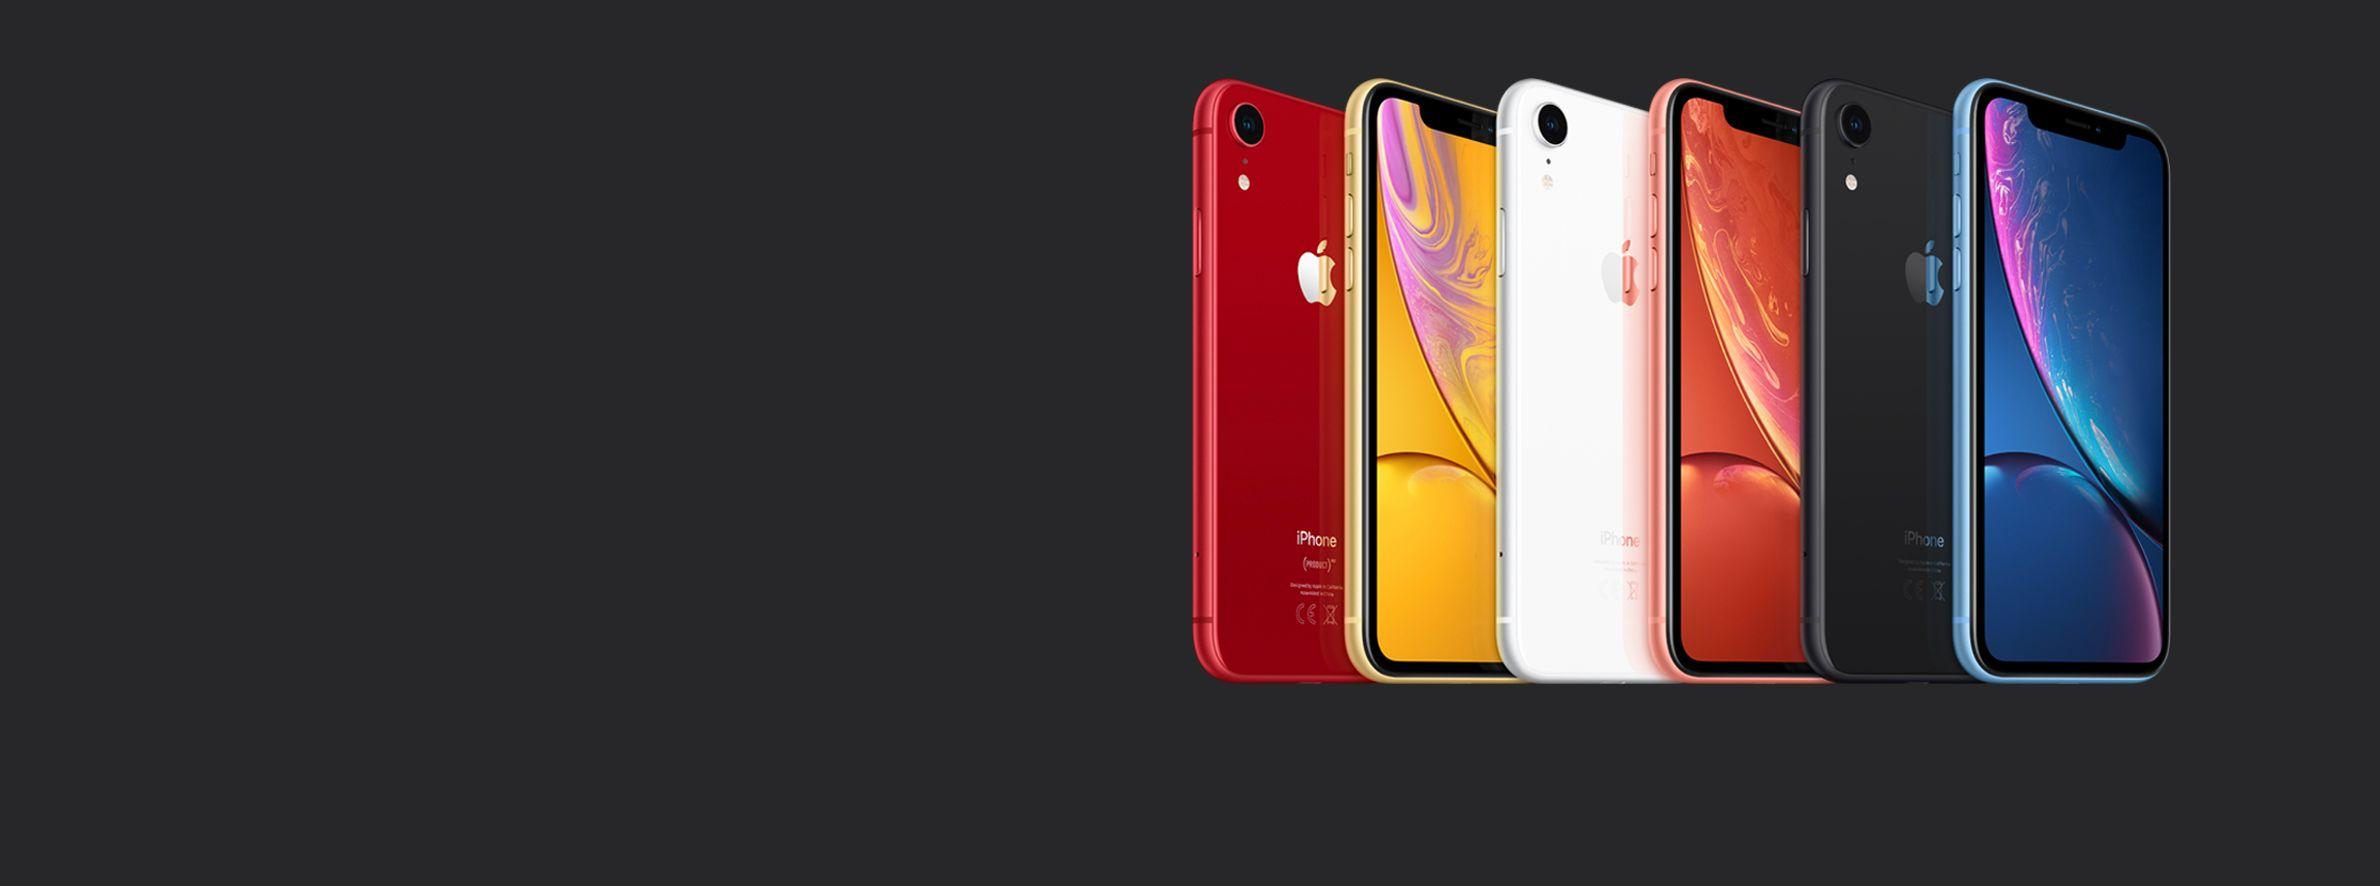 iPhone | Mobile Phones & Accessories | John Lewis & Partners